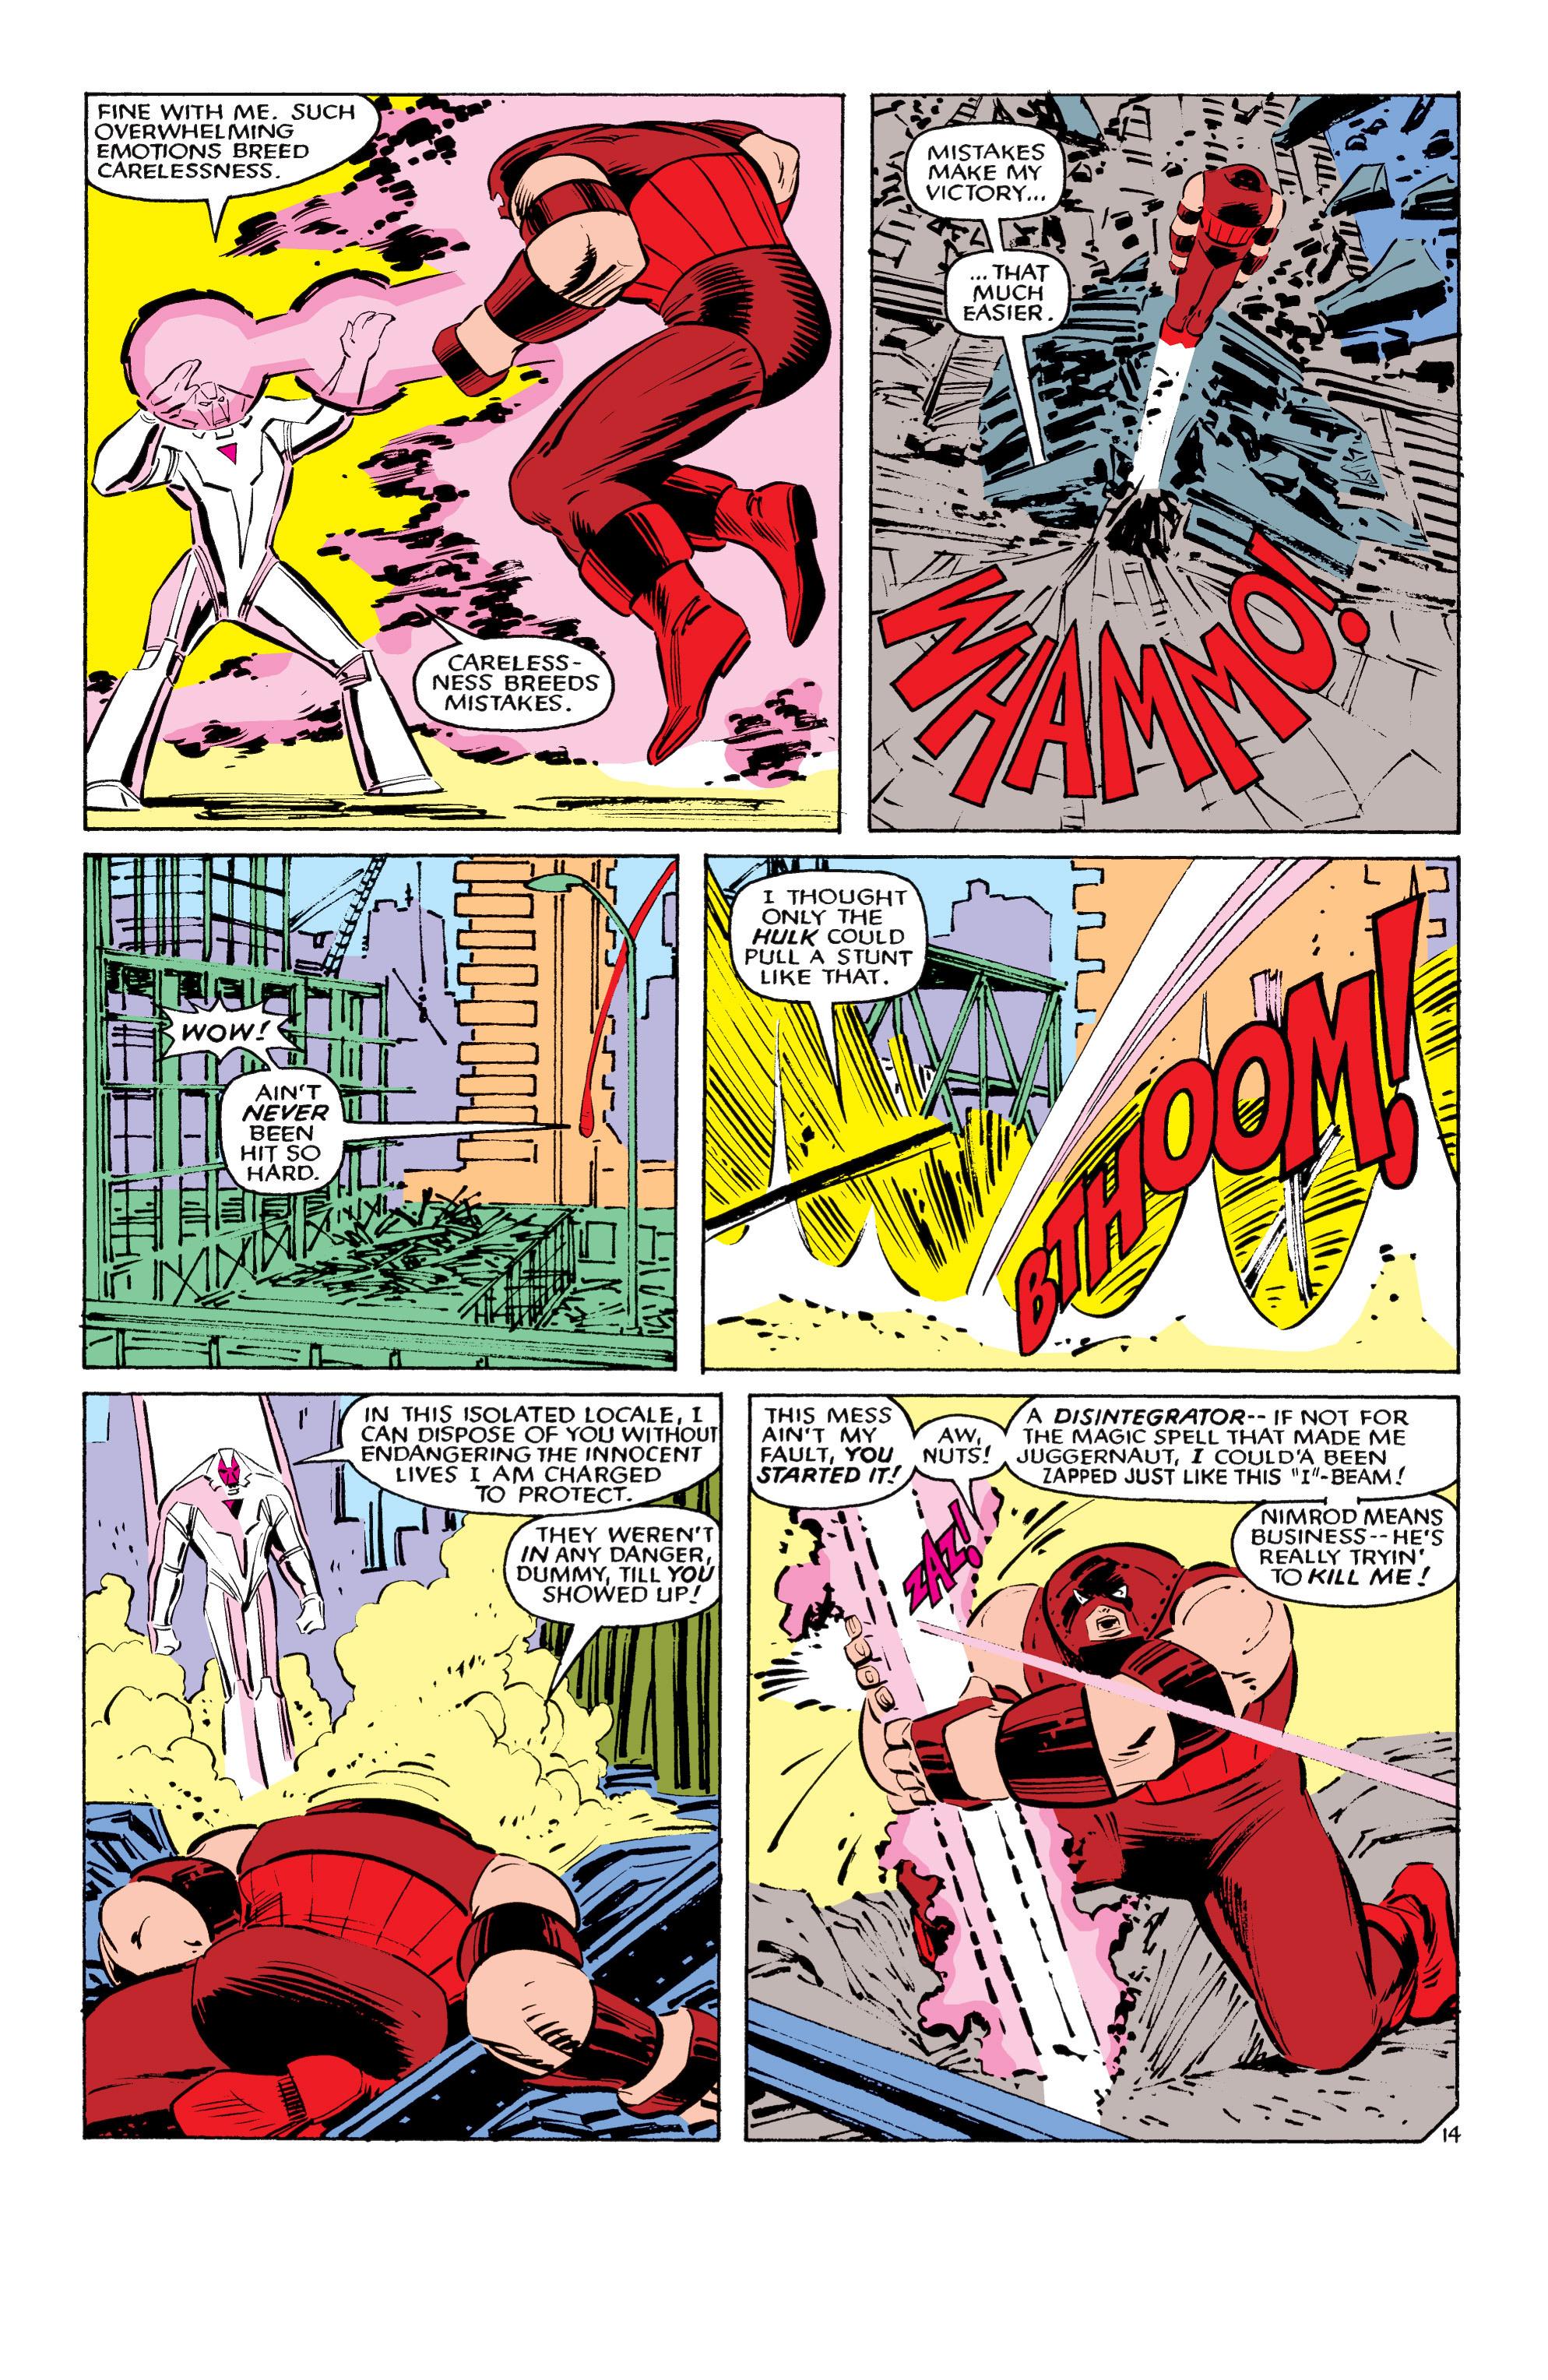 Black widow vs iron man super hero parody infinity war cosplay 2 cumshots 3 squirts teen and squirt - 5 7